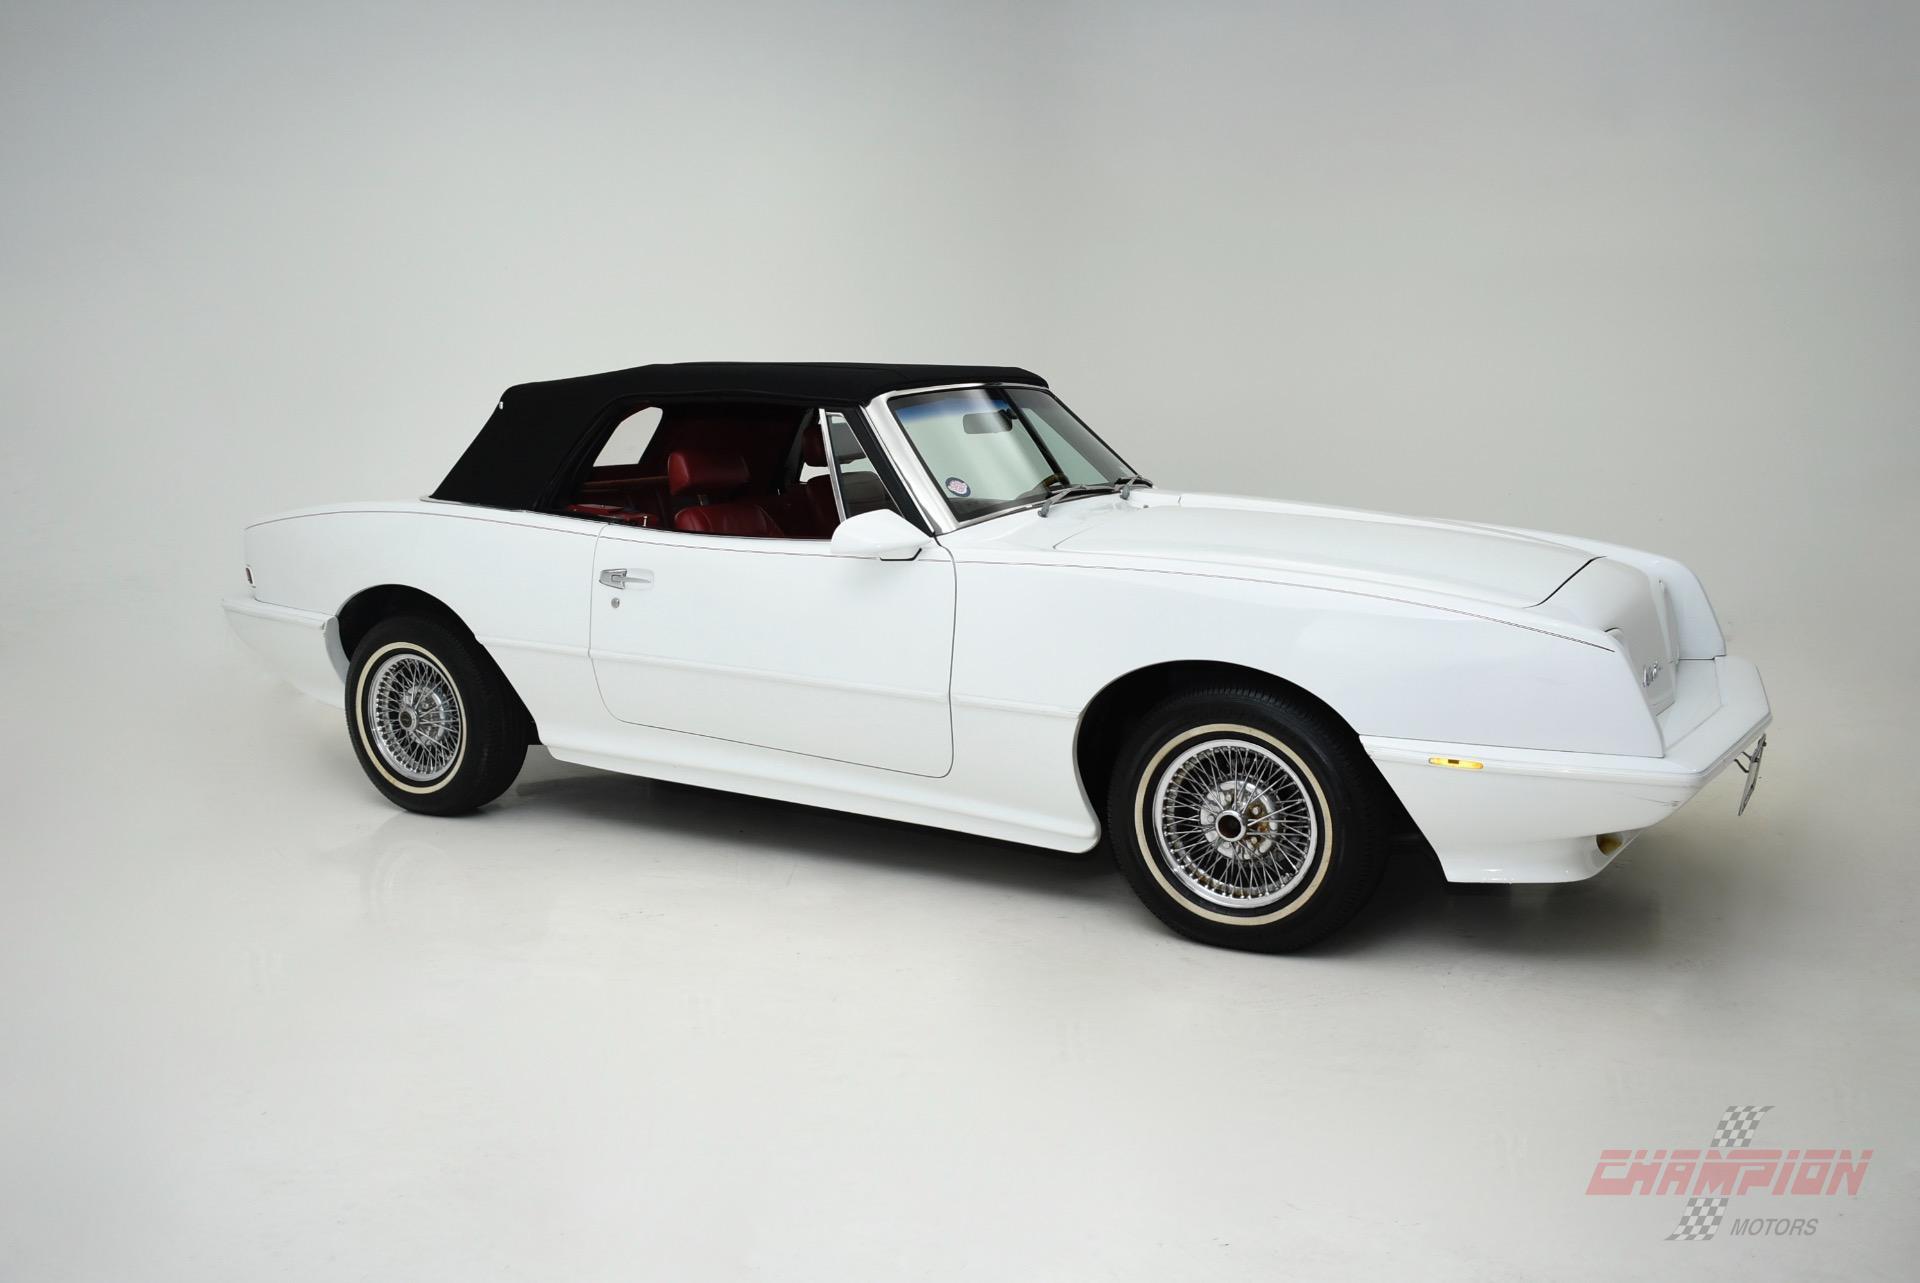 1989 Studebaker Convertible --: 1989 Avanti Convertible  11,752 Miles White Convertible 305 C.I. Automatic